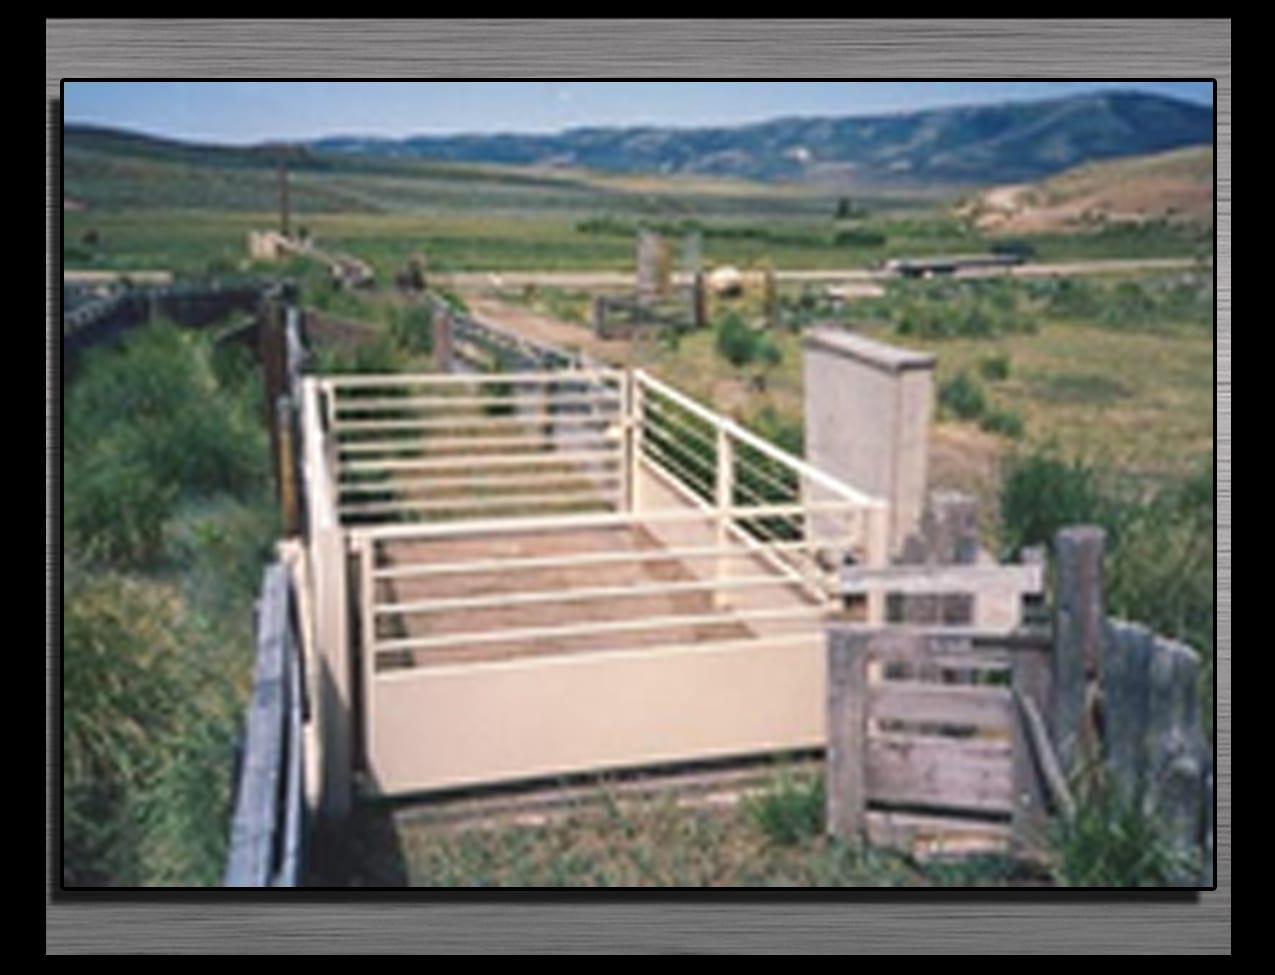 livestock-scale